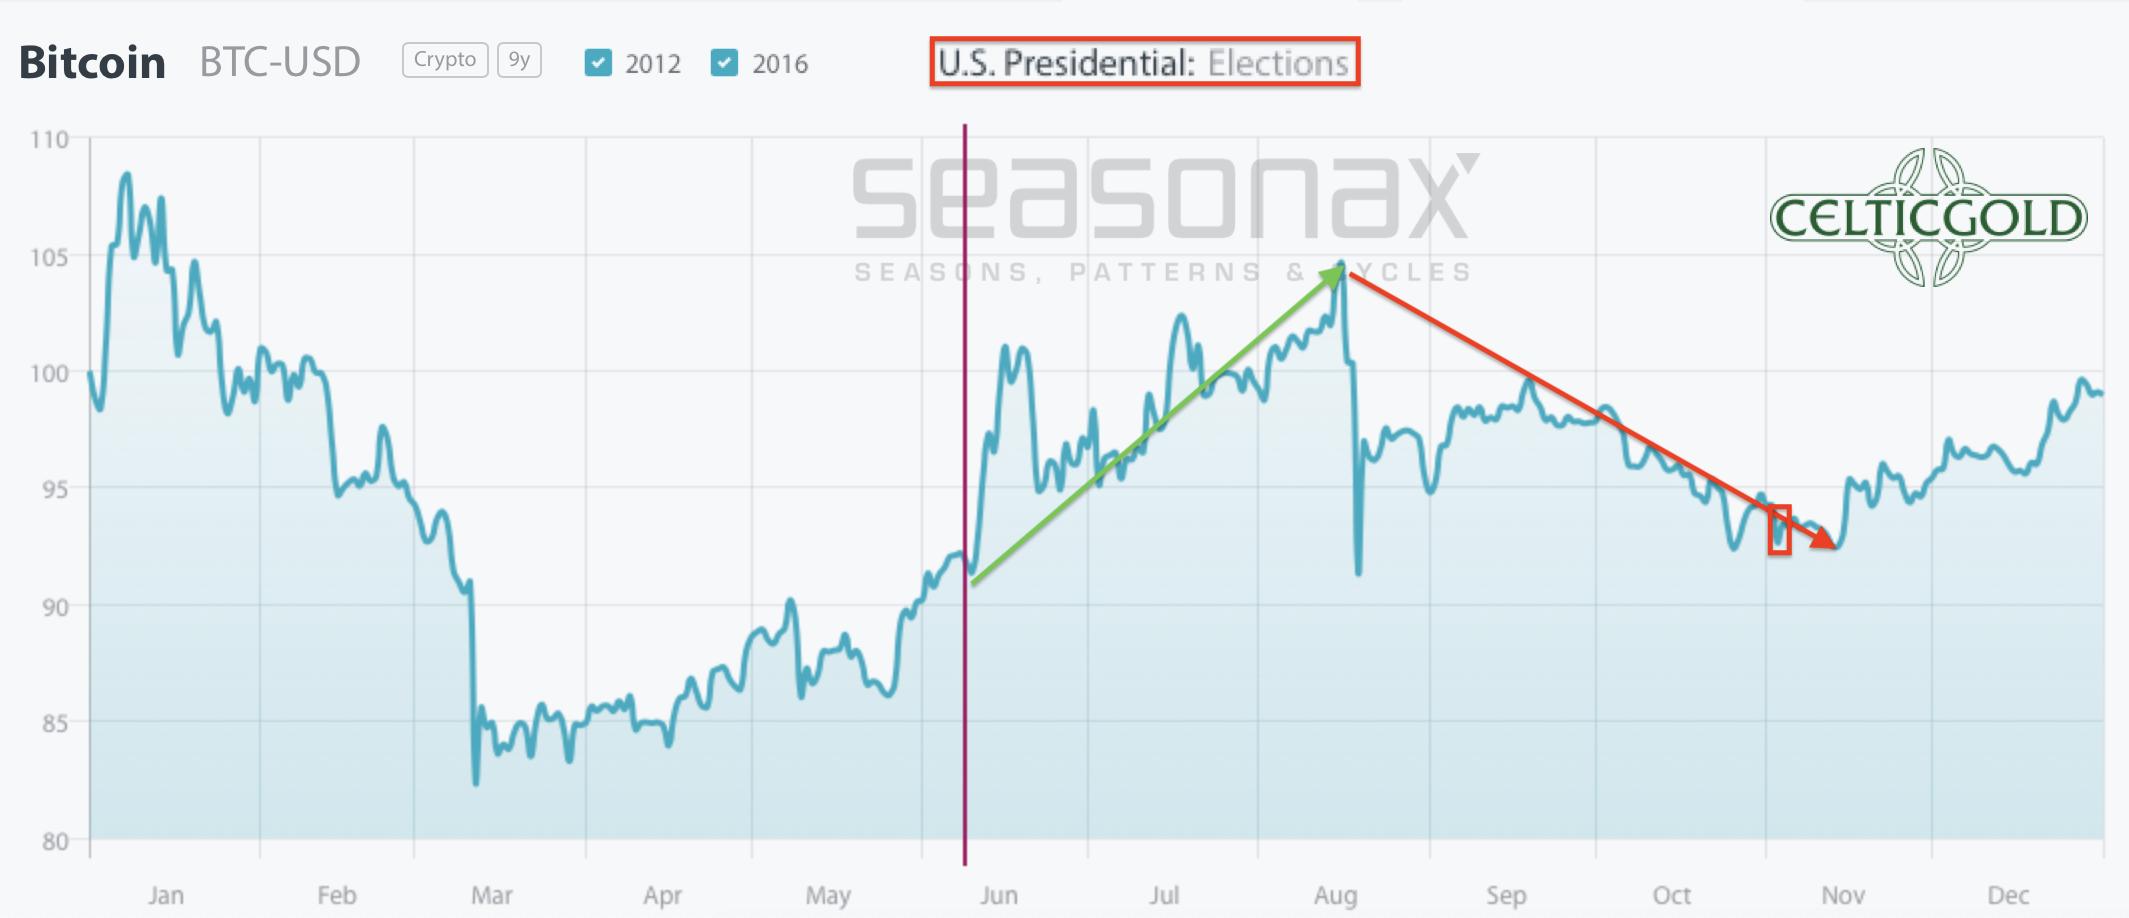 Bitcoin seasonality in US election years. Source: Seasonax